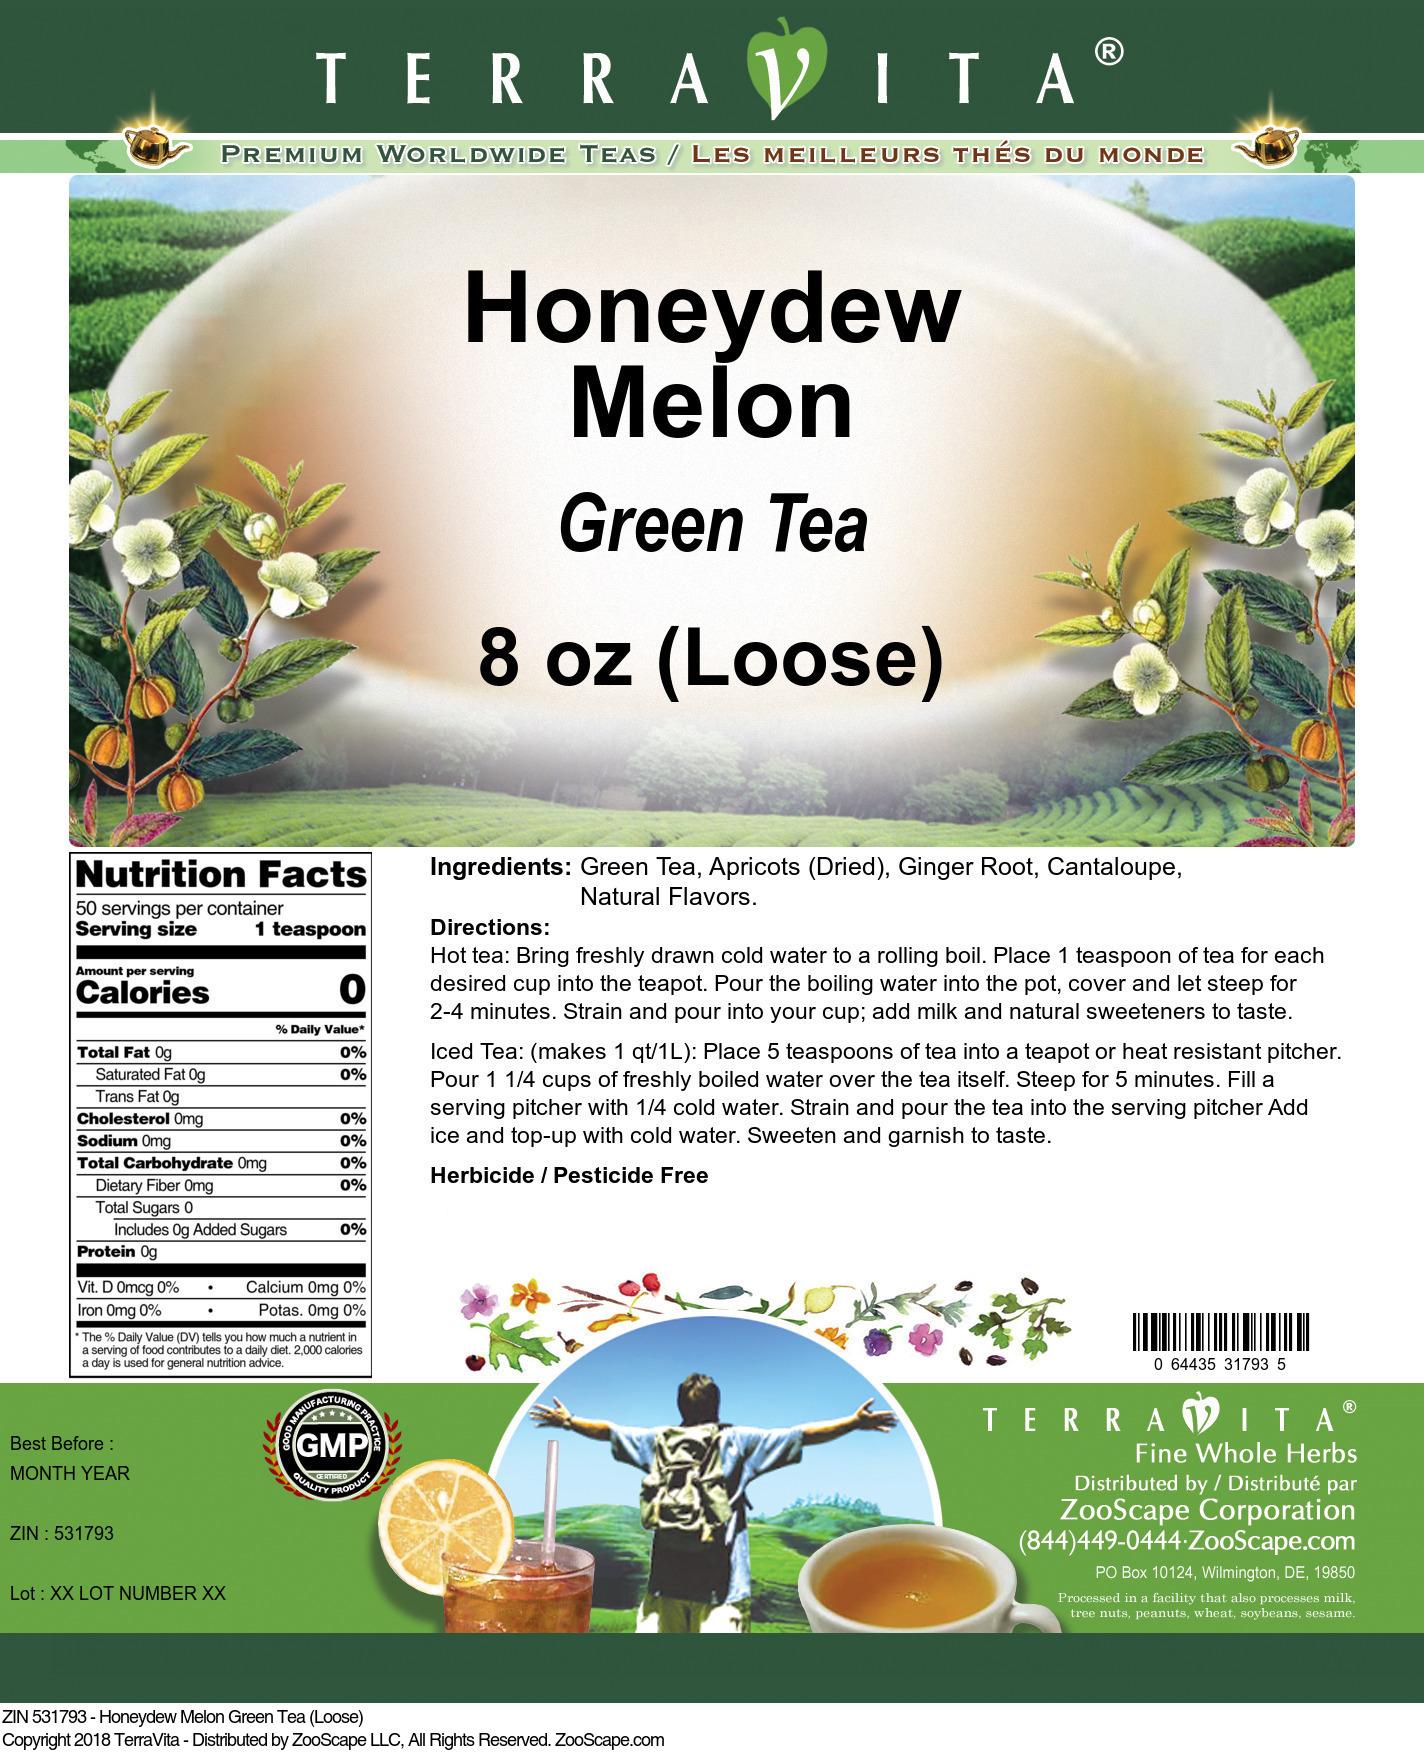 Honeydew Melon Green Tea (Loose)